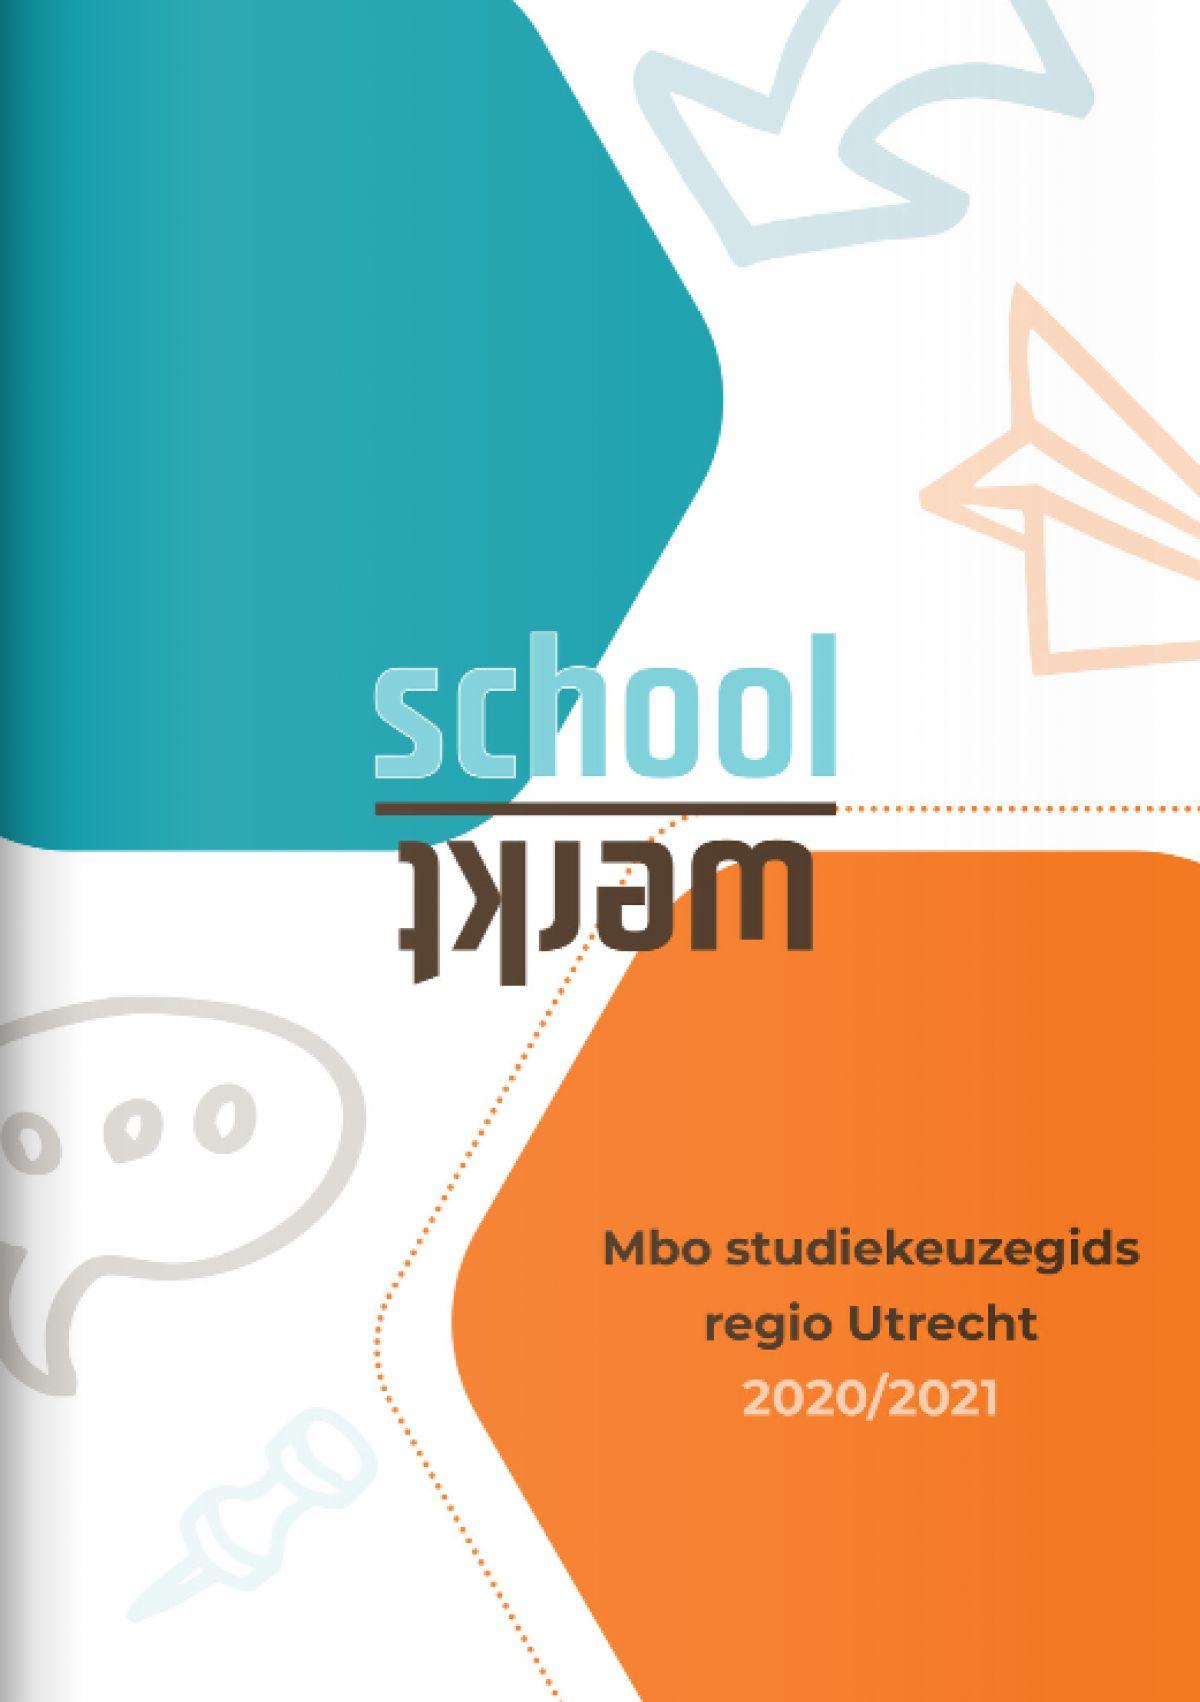 MBO Studiekeuzegids